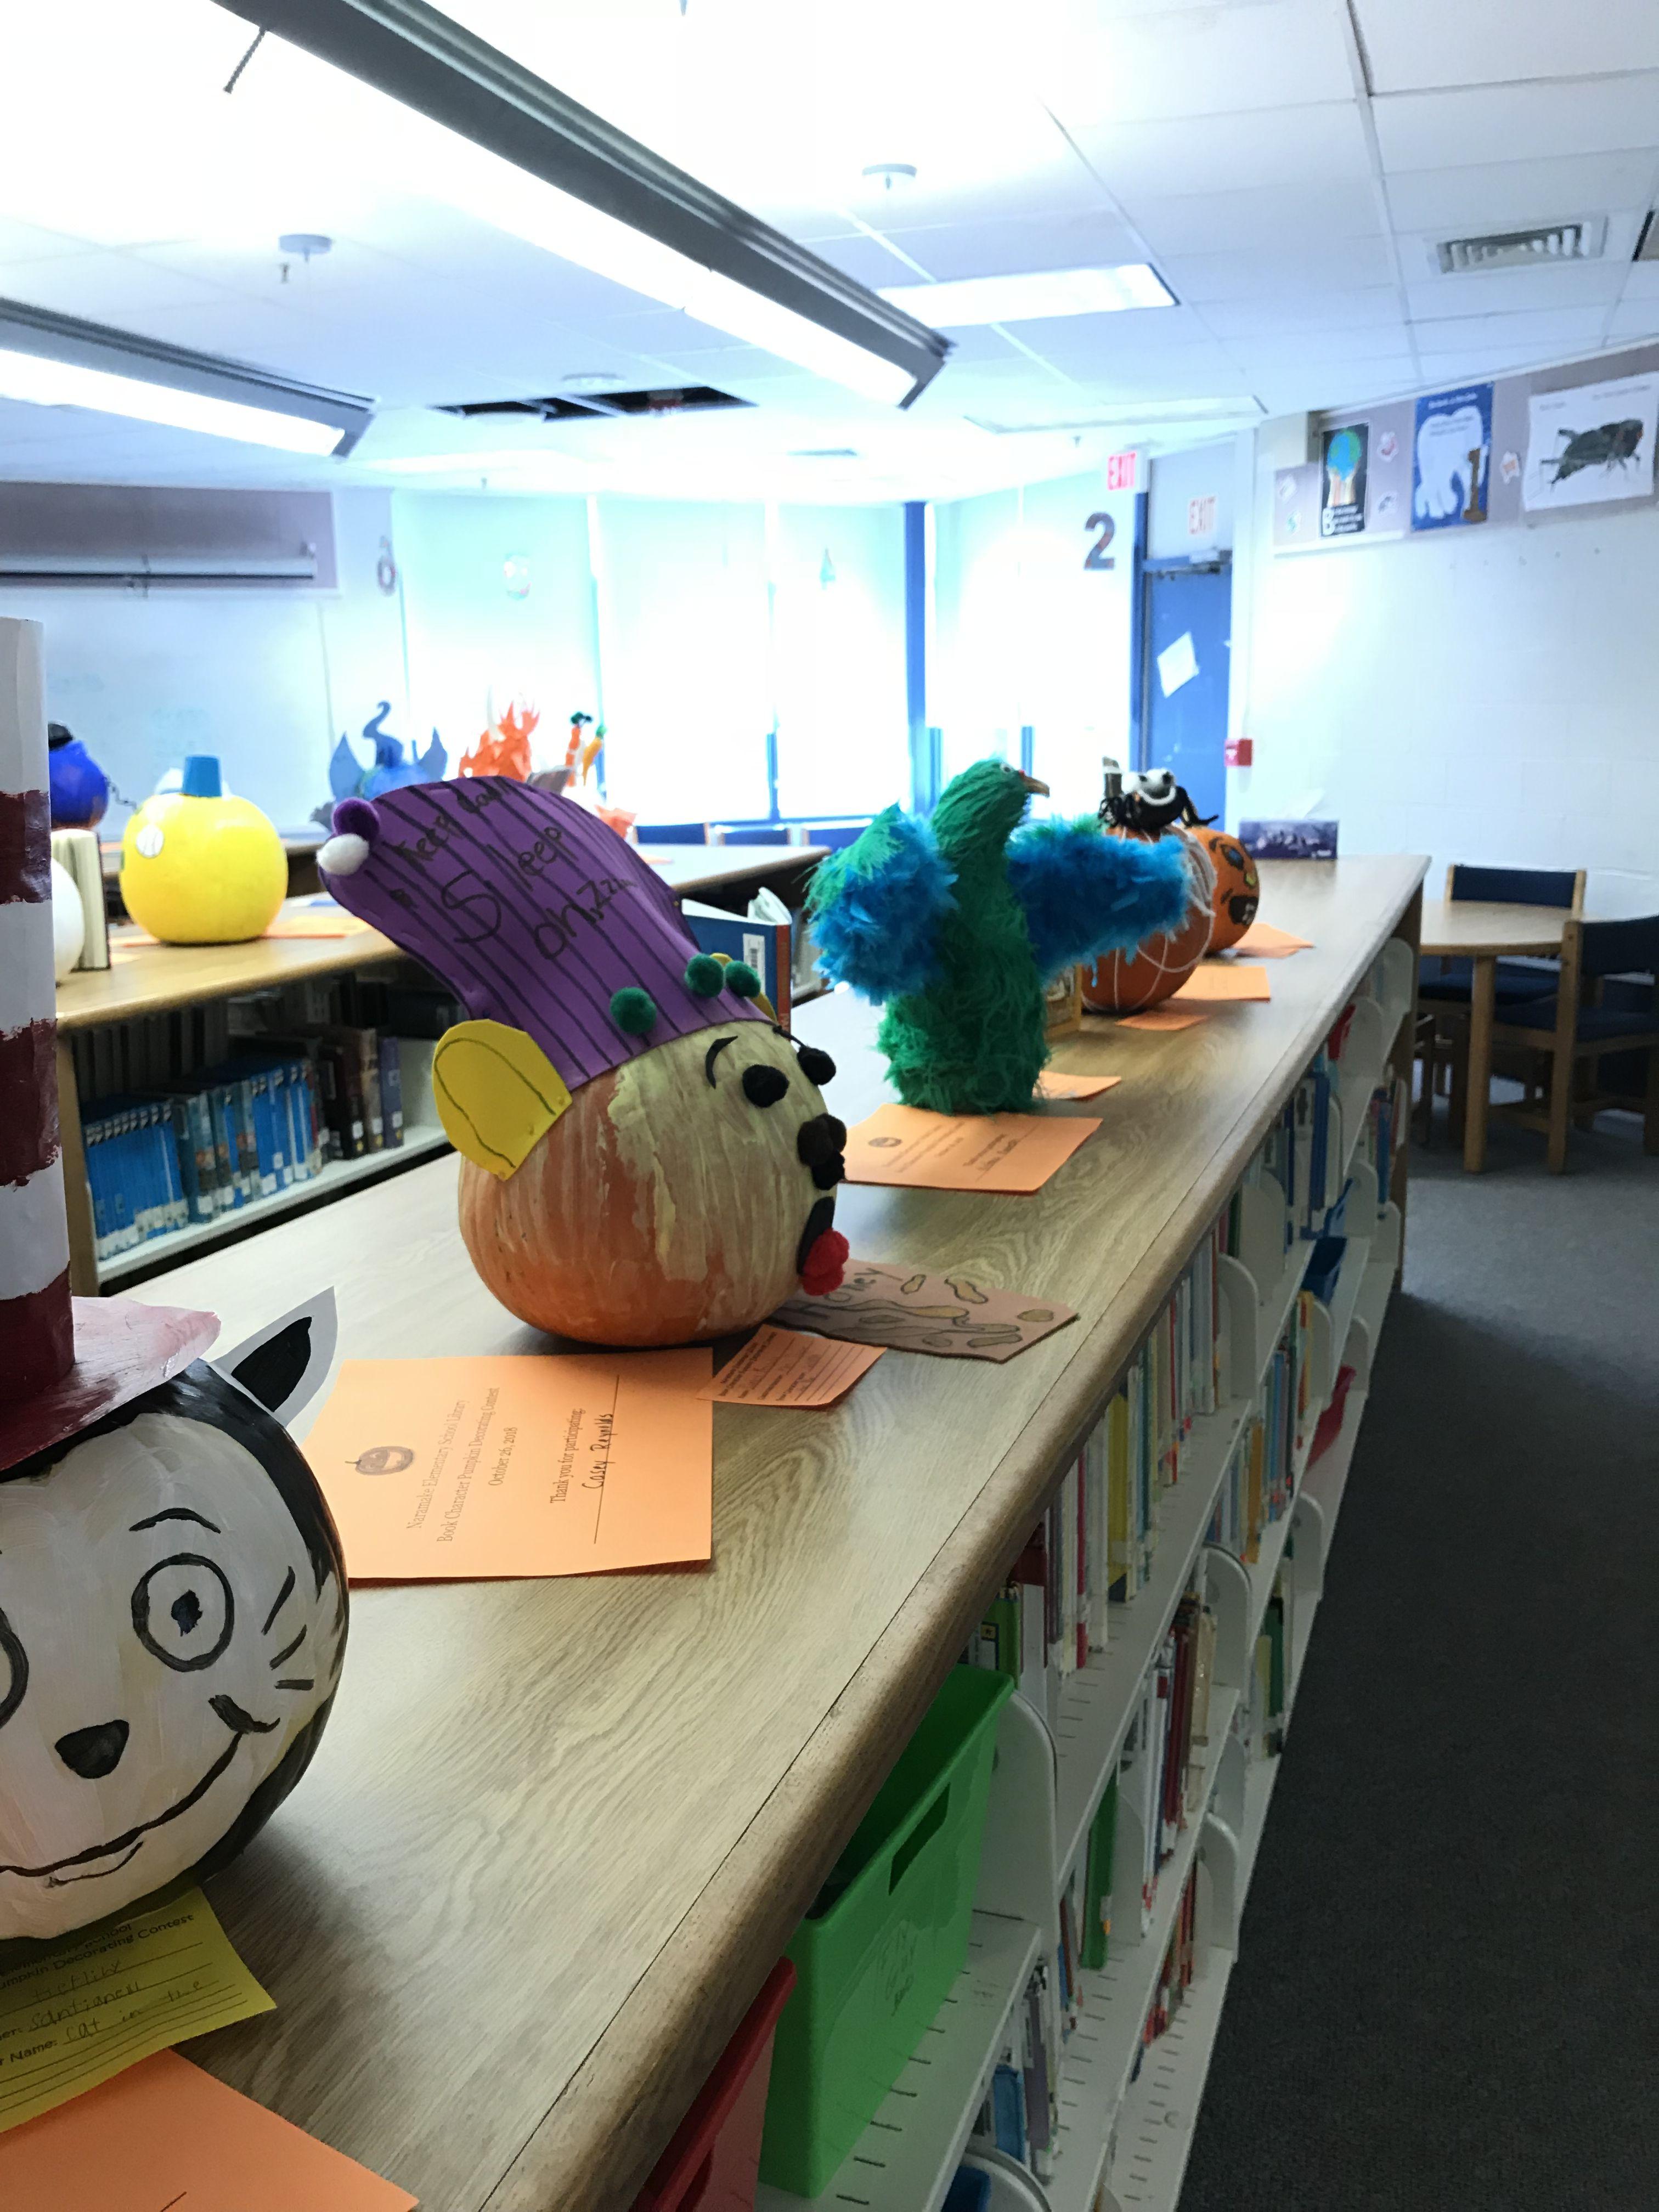 Pin by Doreen KirklandGreen on Library Fun School